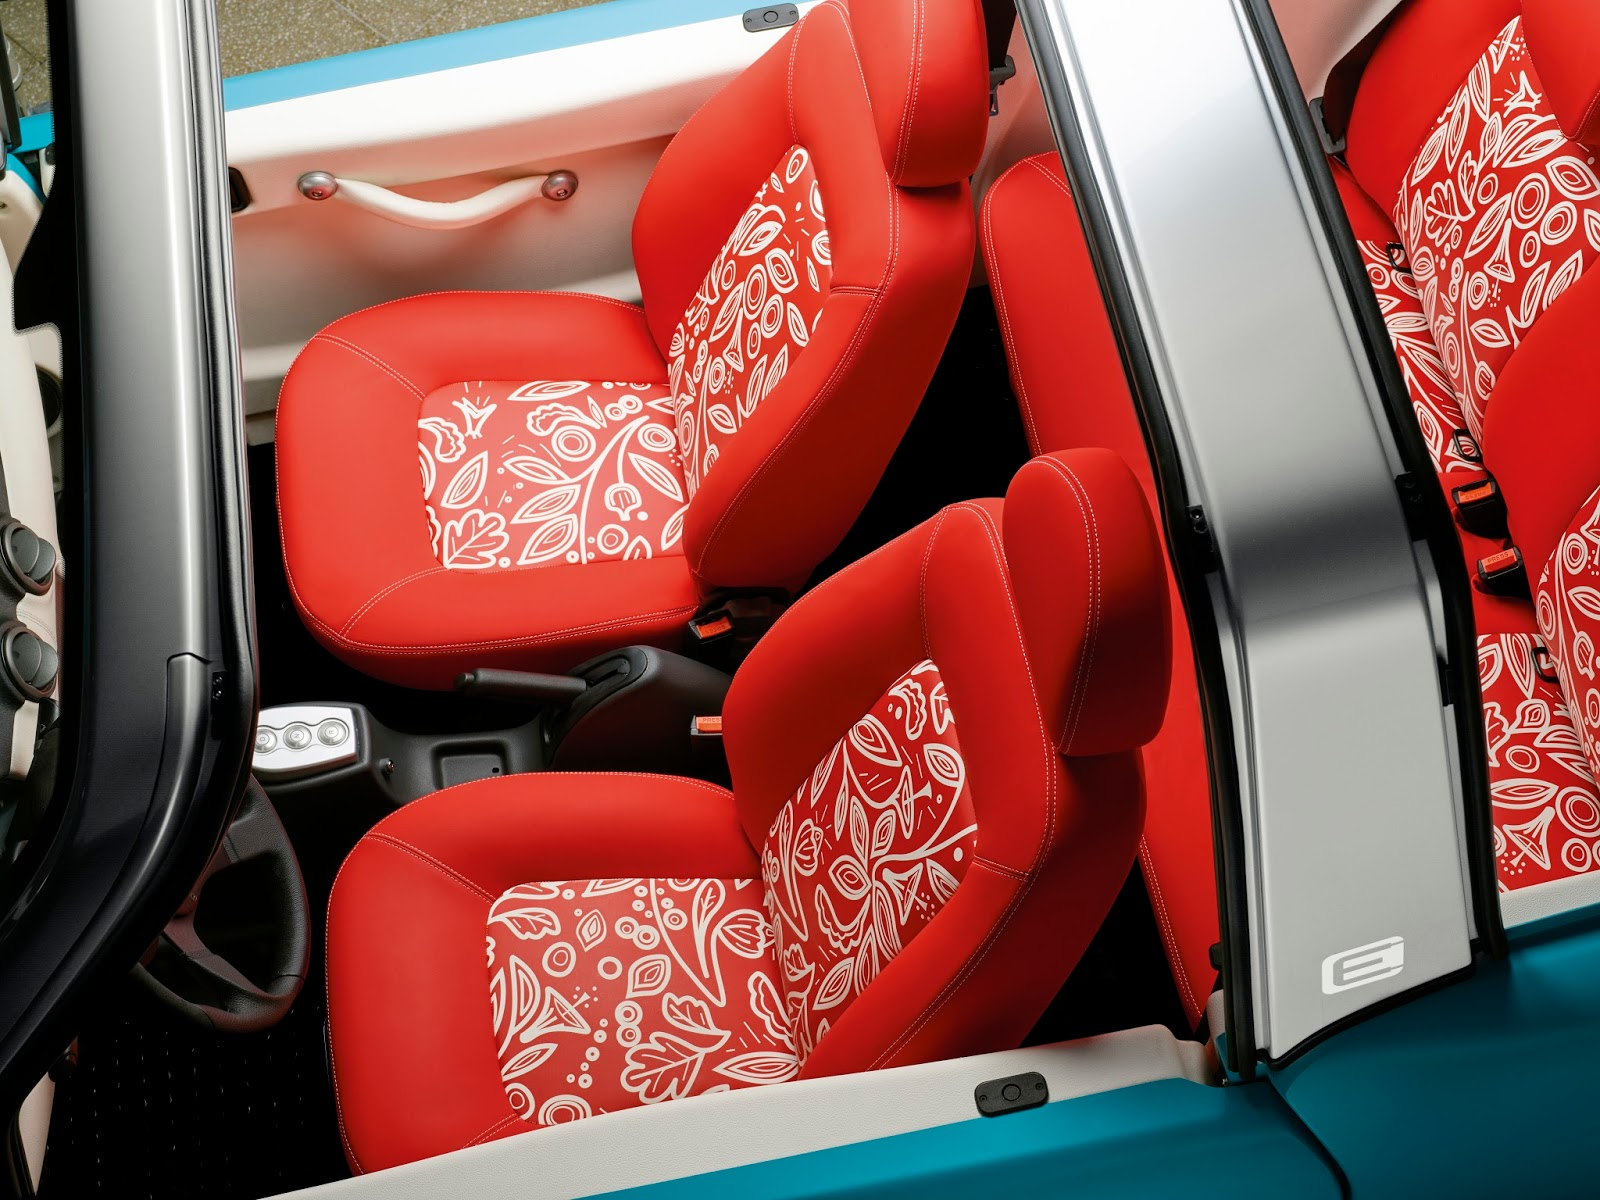 CL%2B16.005.005 Με 5 Παγκόσμιες Πρεμιέρες η Citroën Στο Σαλόνι Αυτοκινήτου της Γενεύης